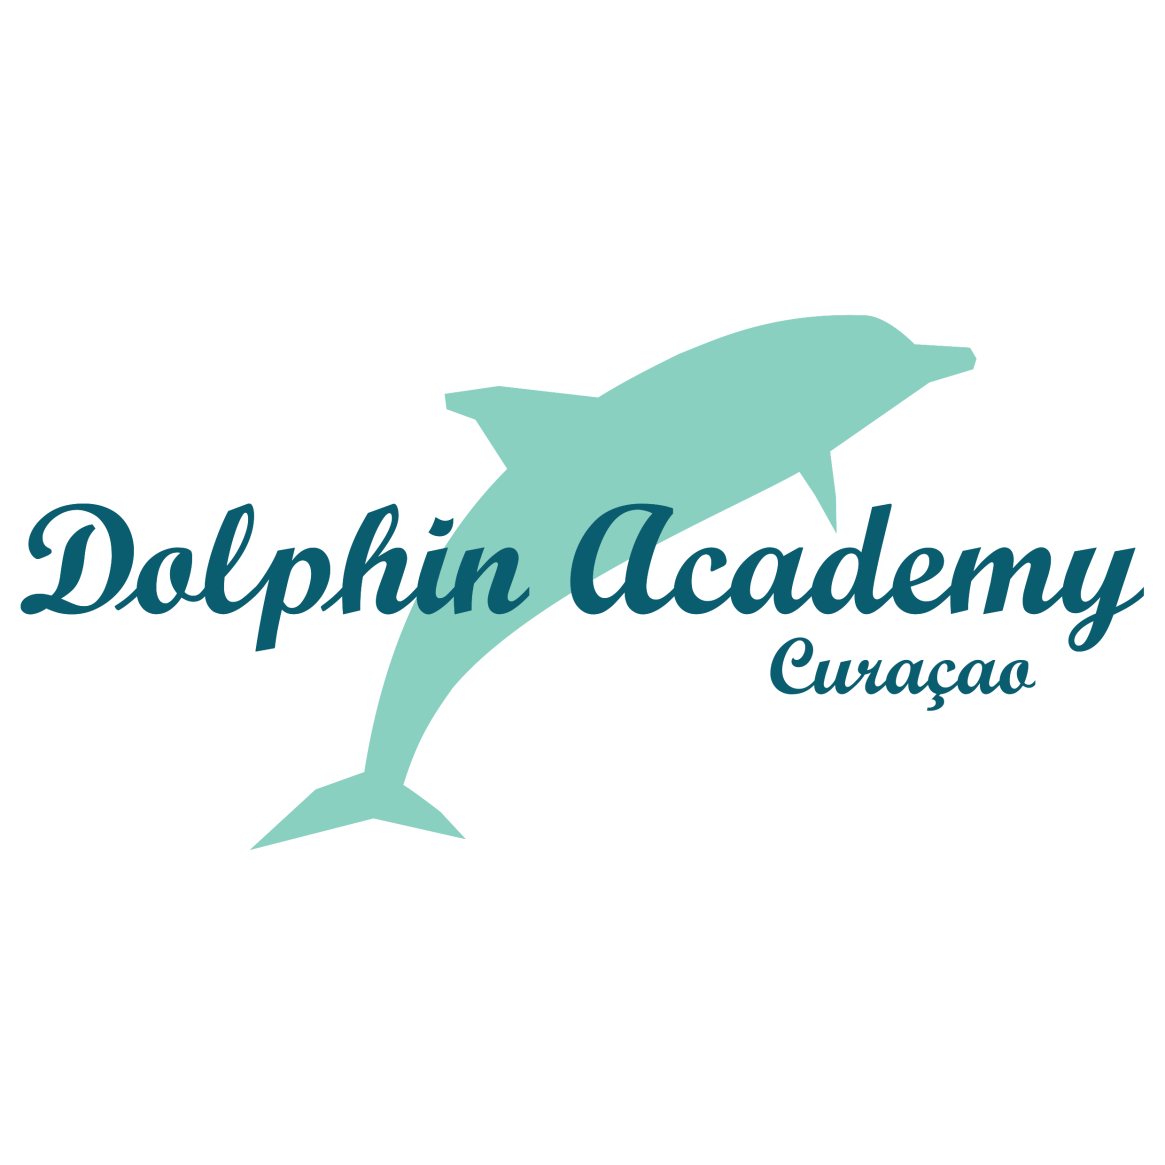 DolphinAcademy_logo sq